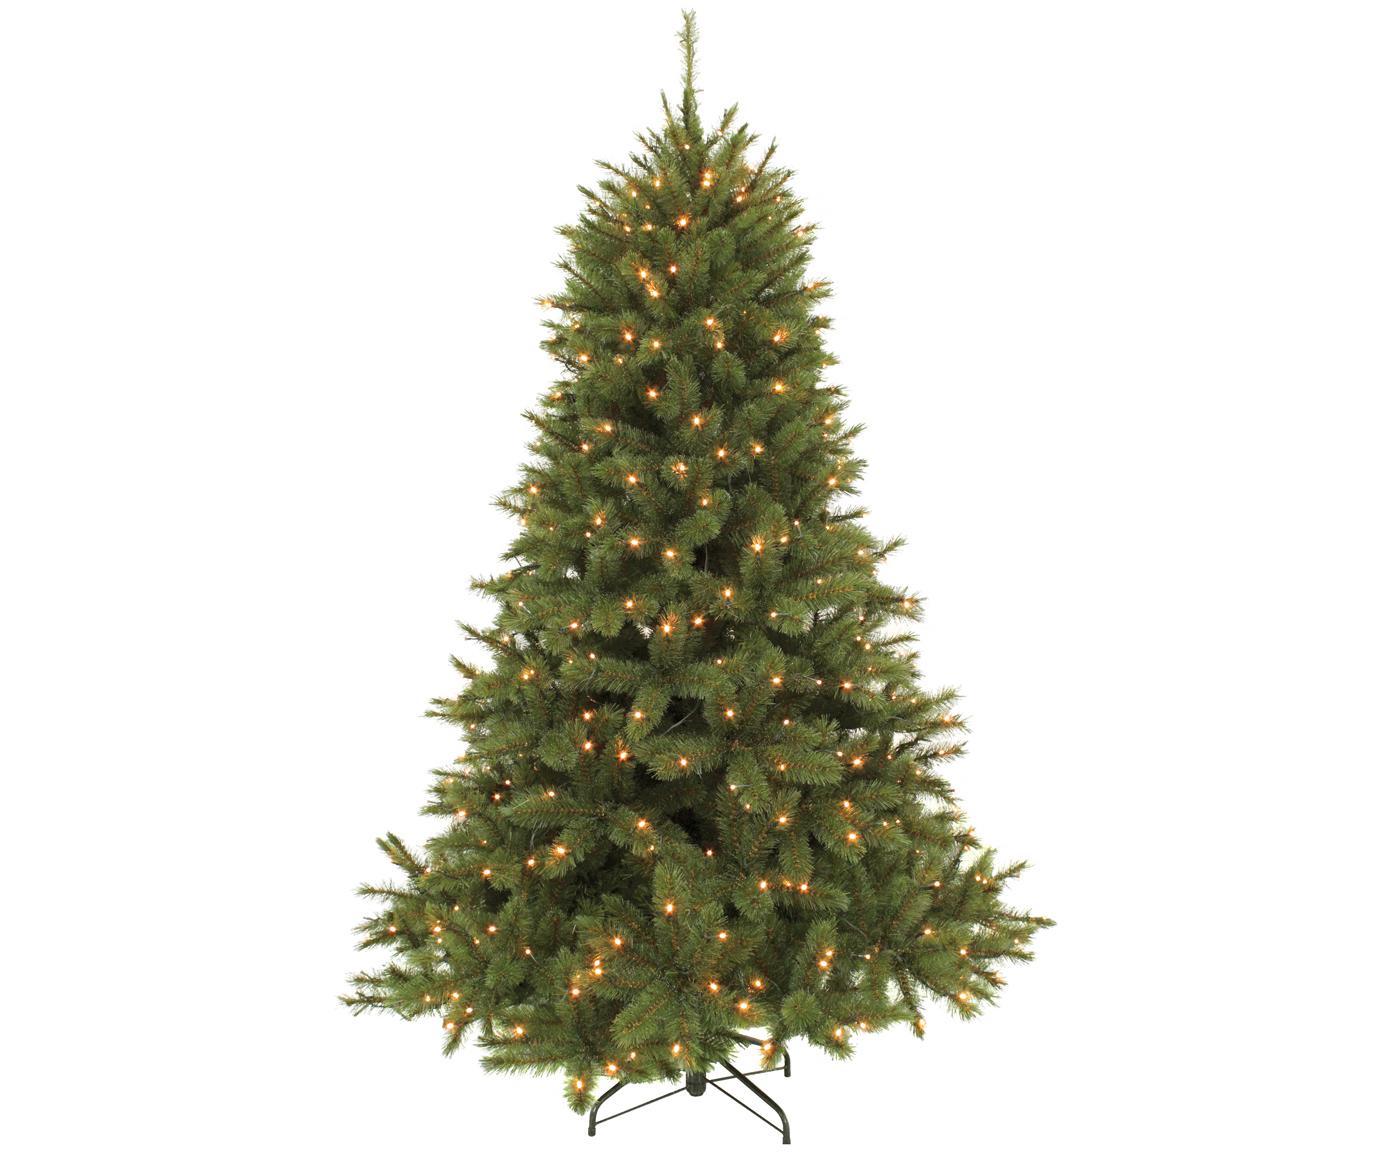 Decoratieve LED kerstboom Forest, Donkergroen, Ø 140 x H 215 cm